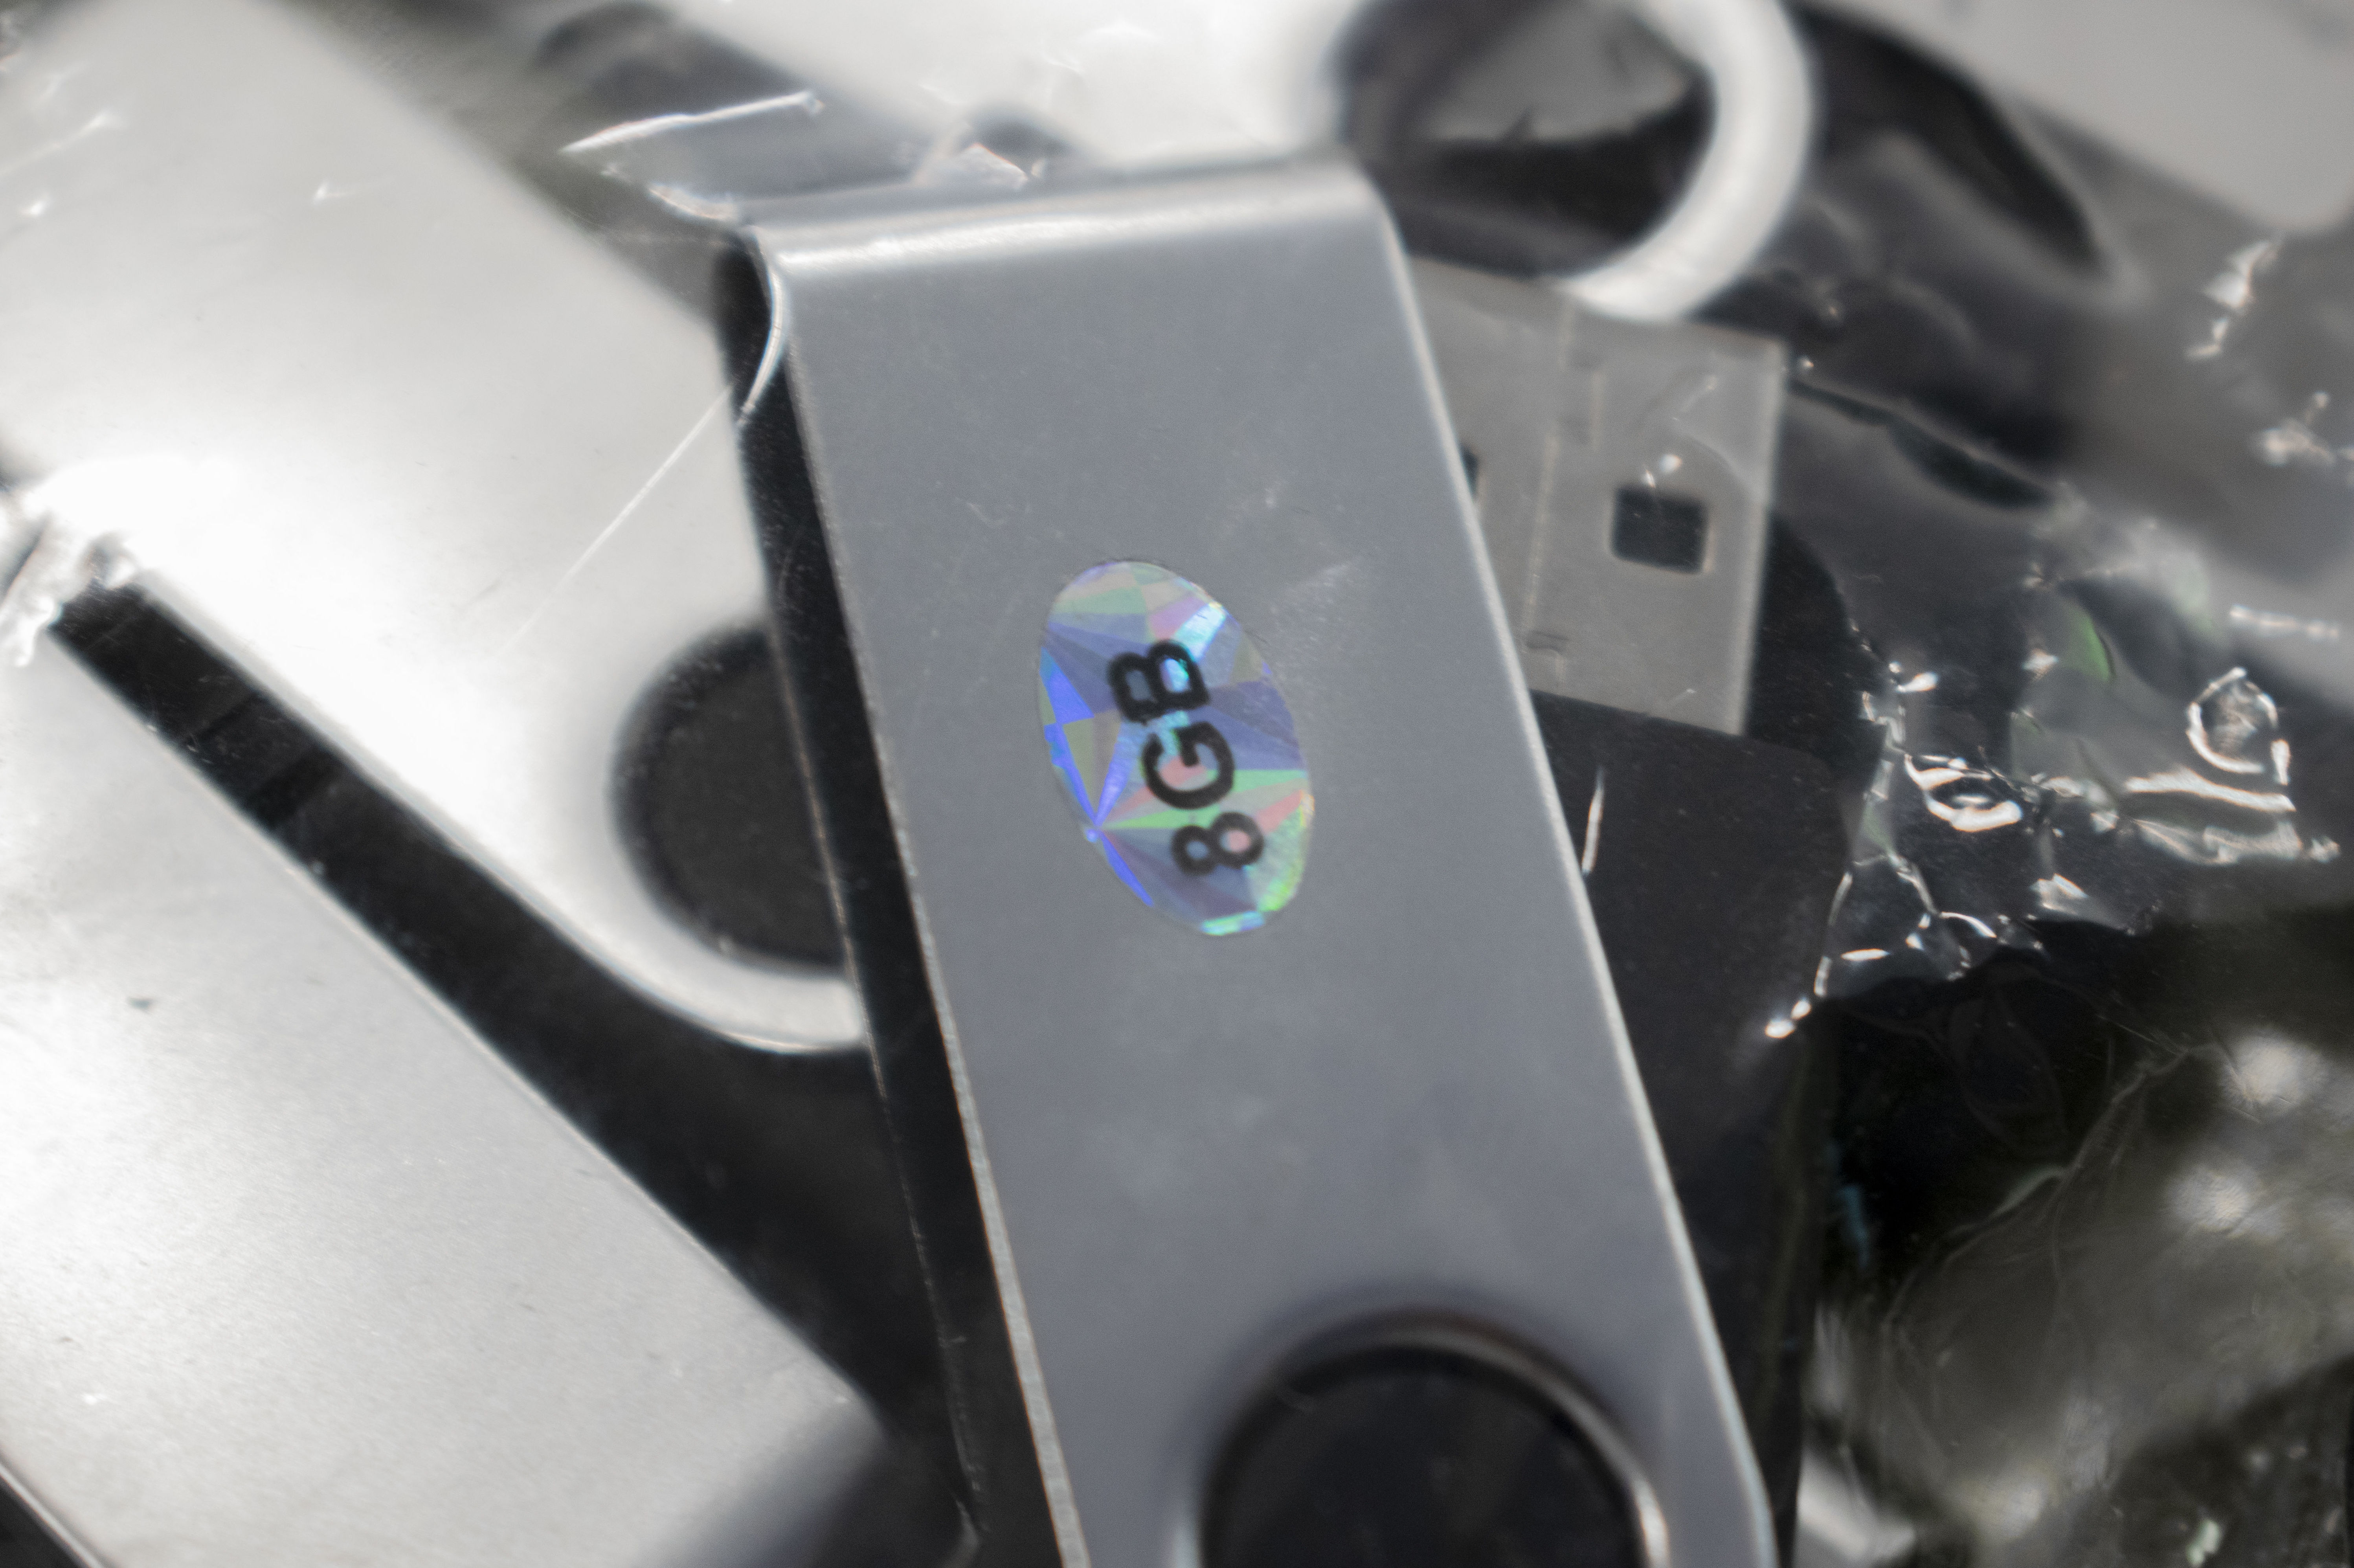 Venta de pen drive de Informática Ecoservei